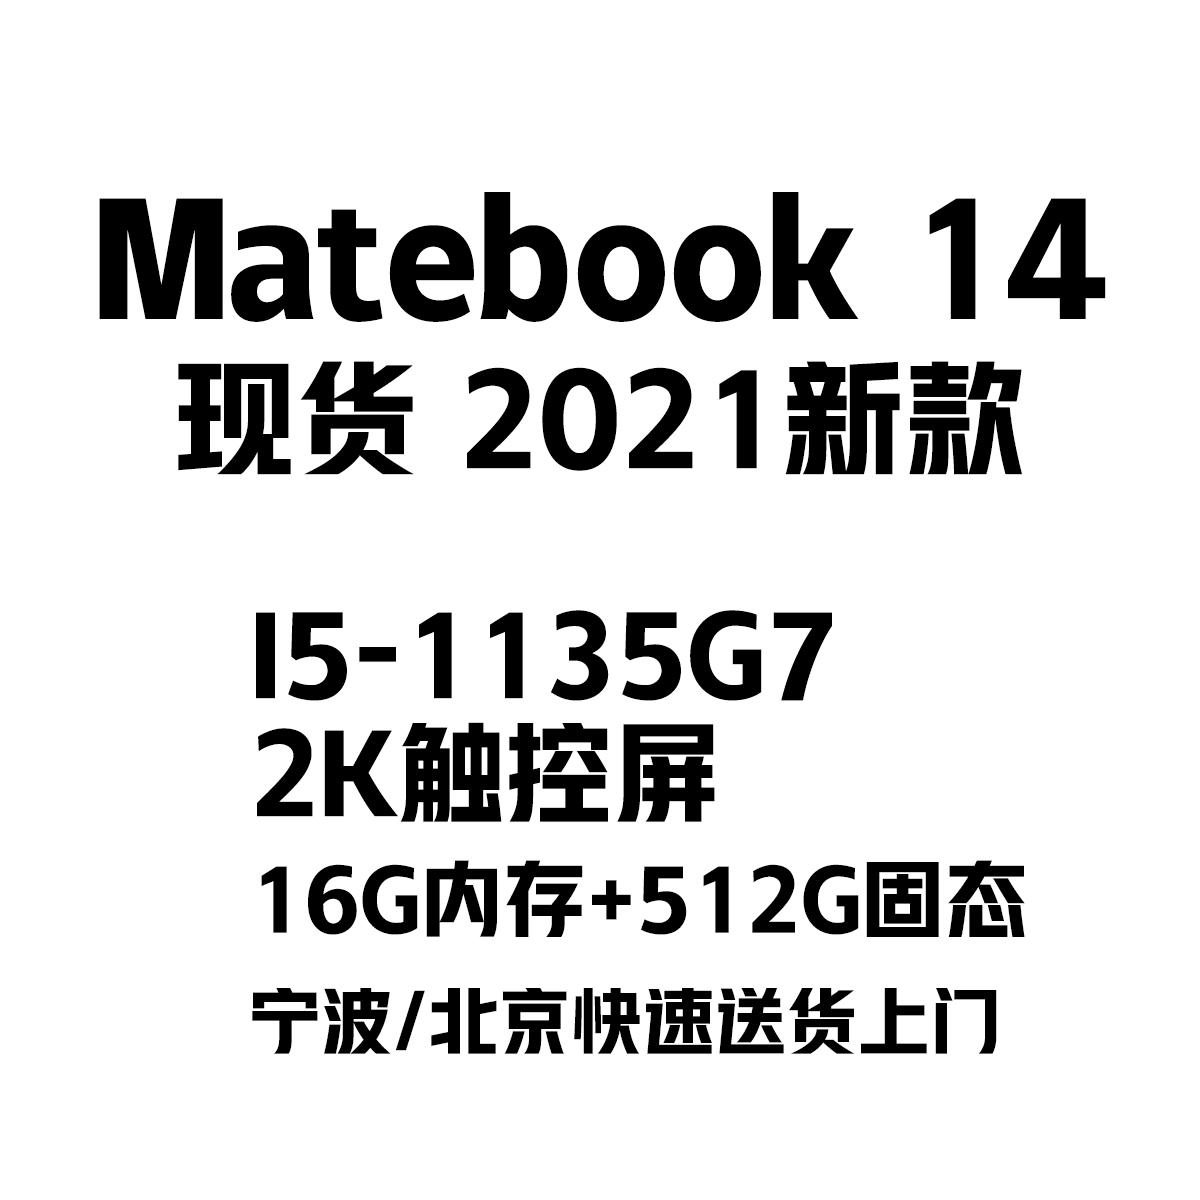 Huawei/ファーウェイMateBook 14 KLV-W 19 2021項11代i 5現物寧波北京花唄